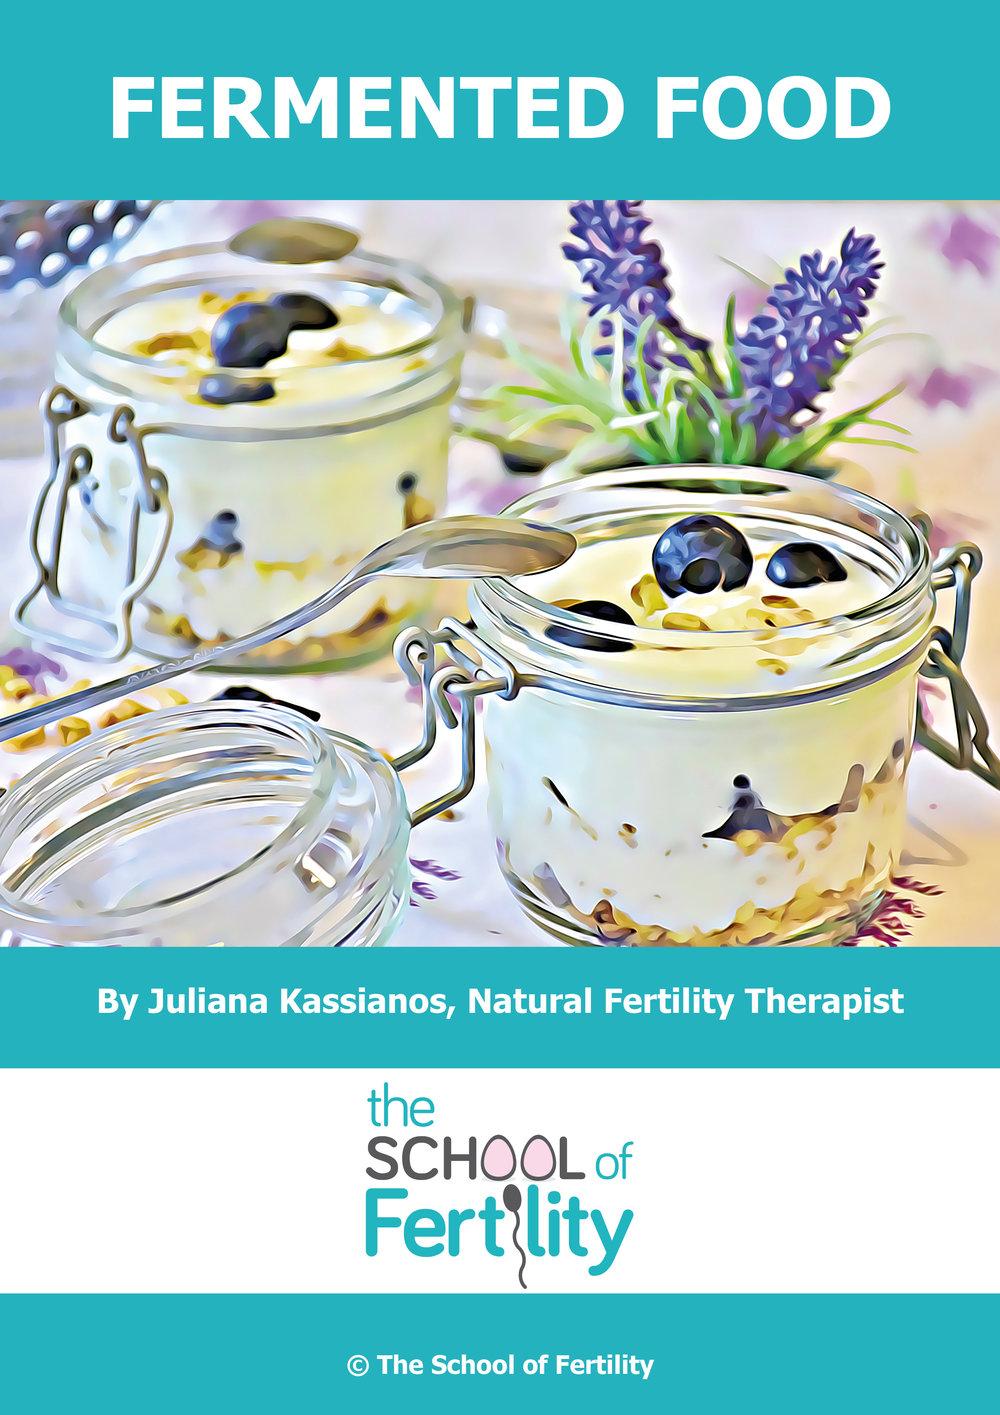 Fermented food (c) The School of Fertility